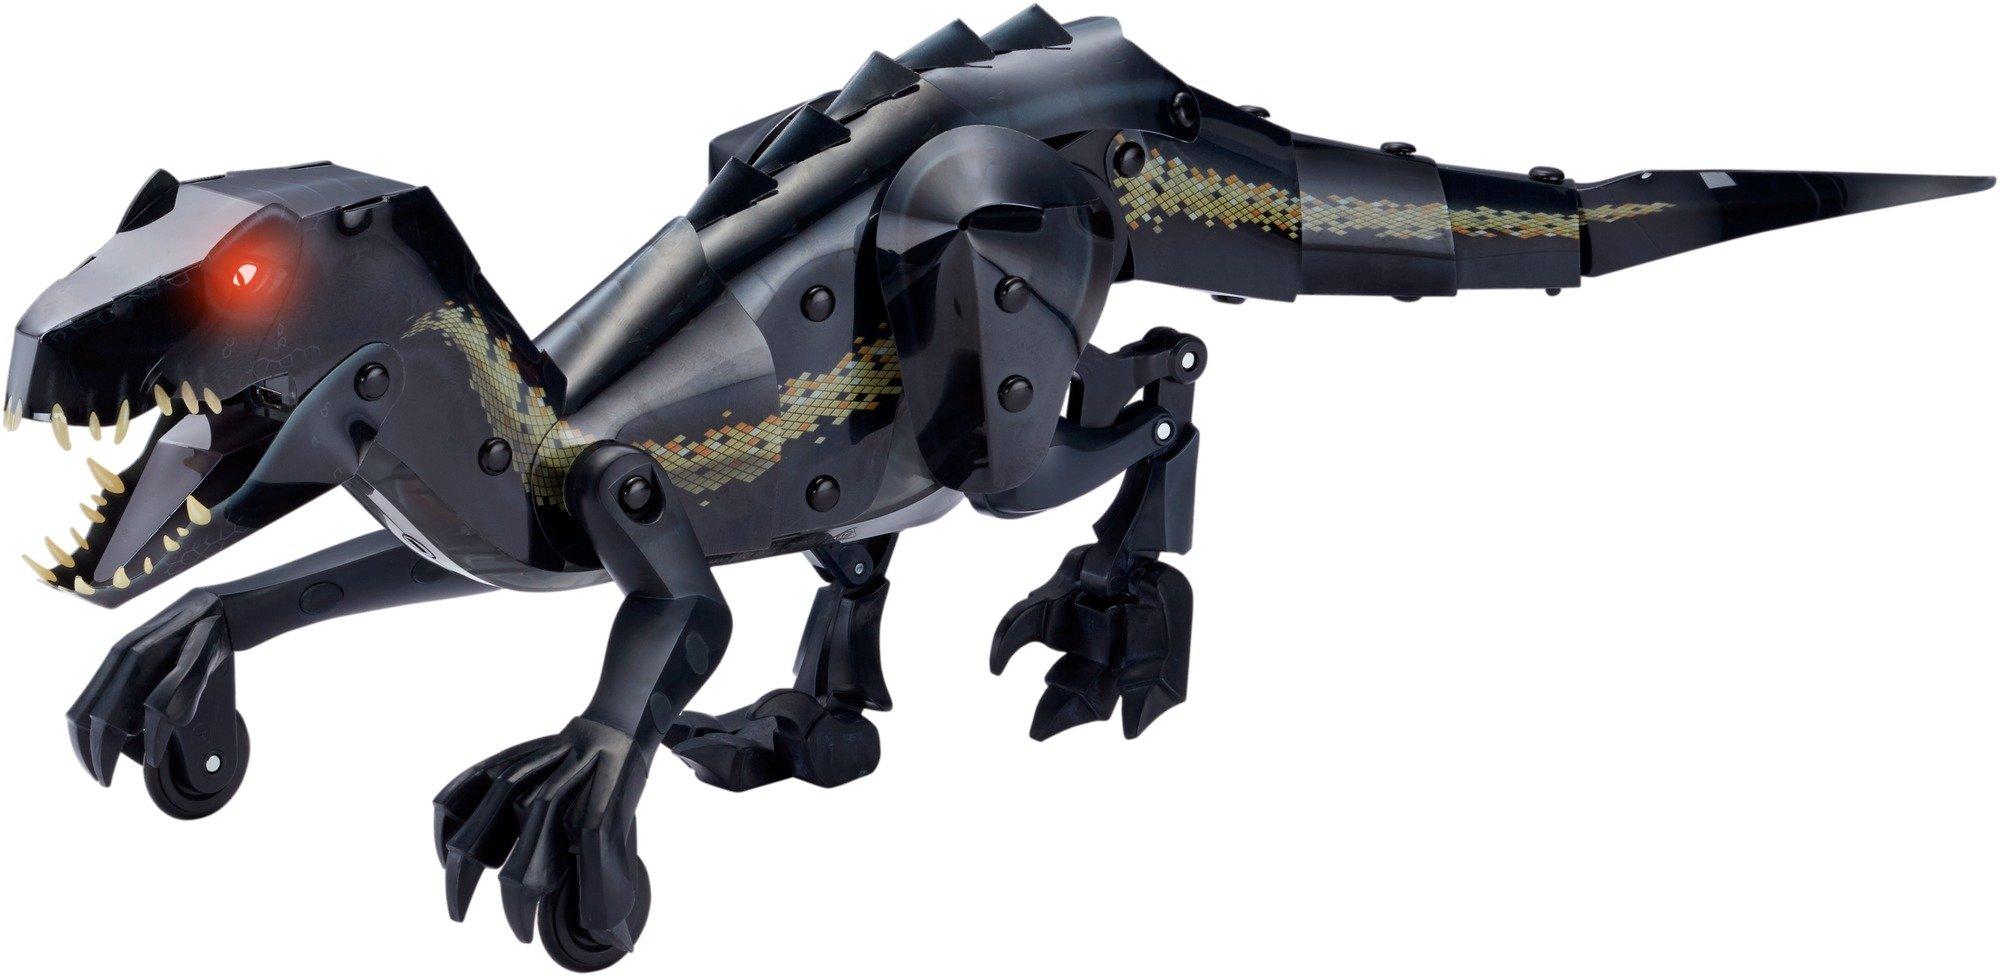 Kamigami Jurassic World Indoraptor Robot by Jurassic World Toys (Image #8)